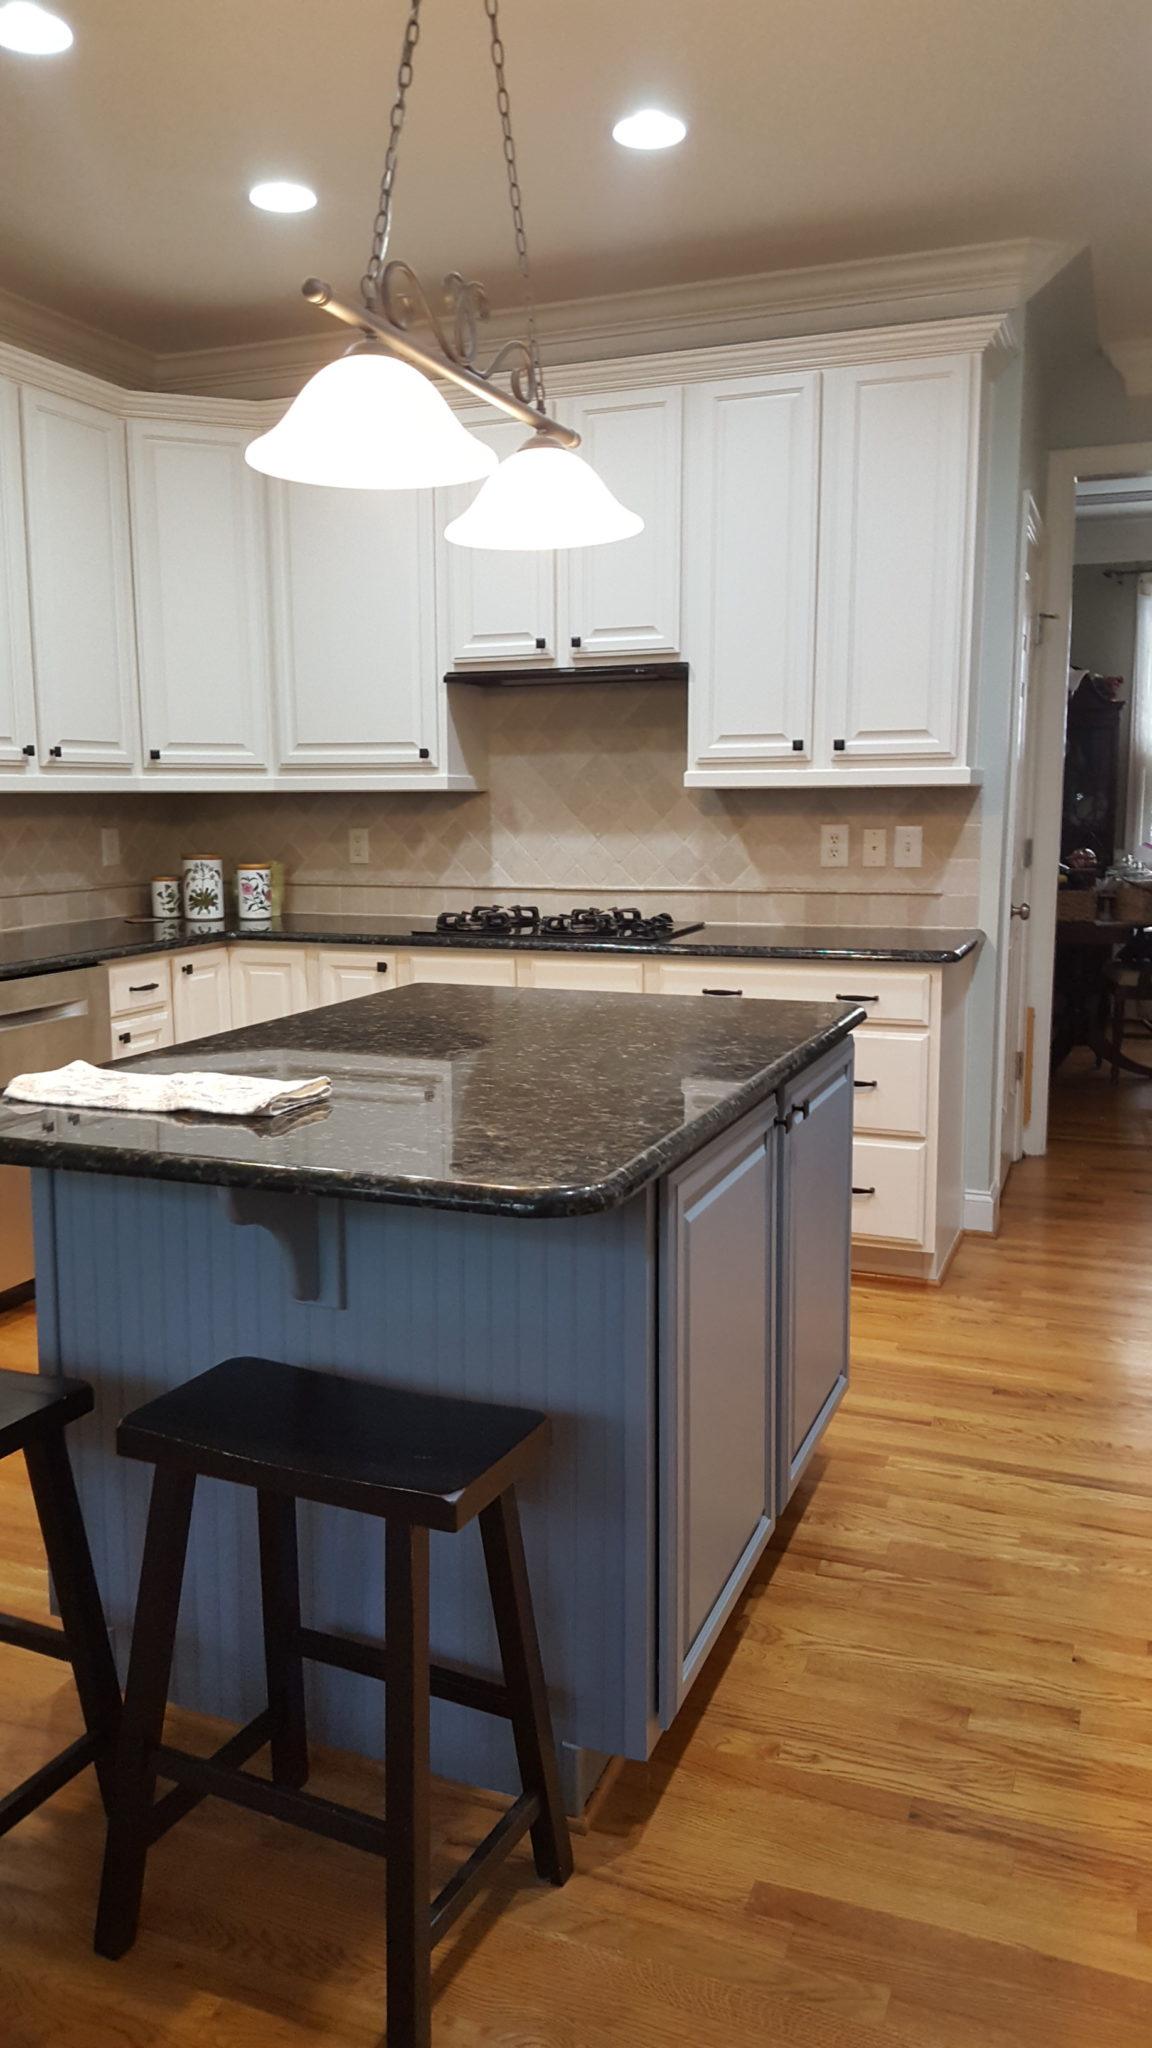 Divine White + Steely Gray Kitchen Cabinets - 2 Cabinet Girls